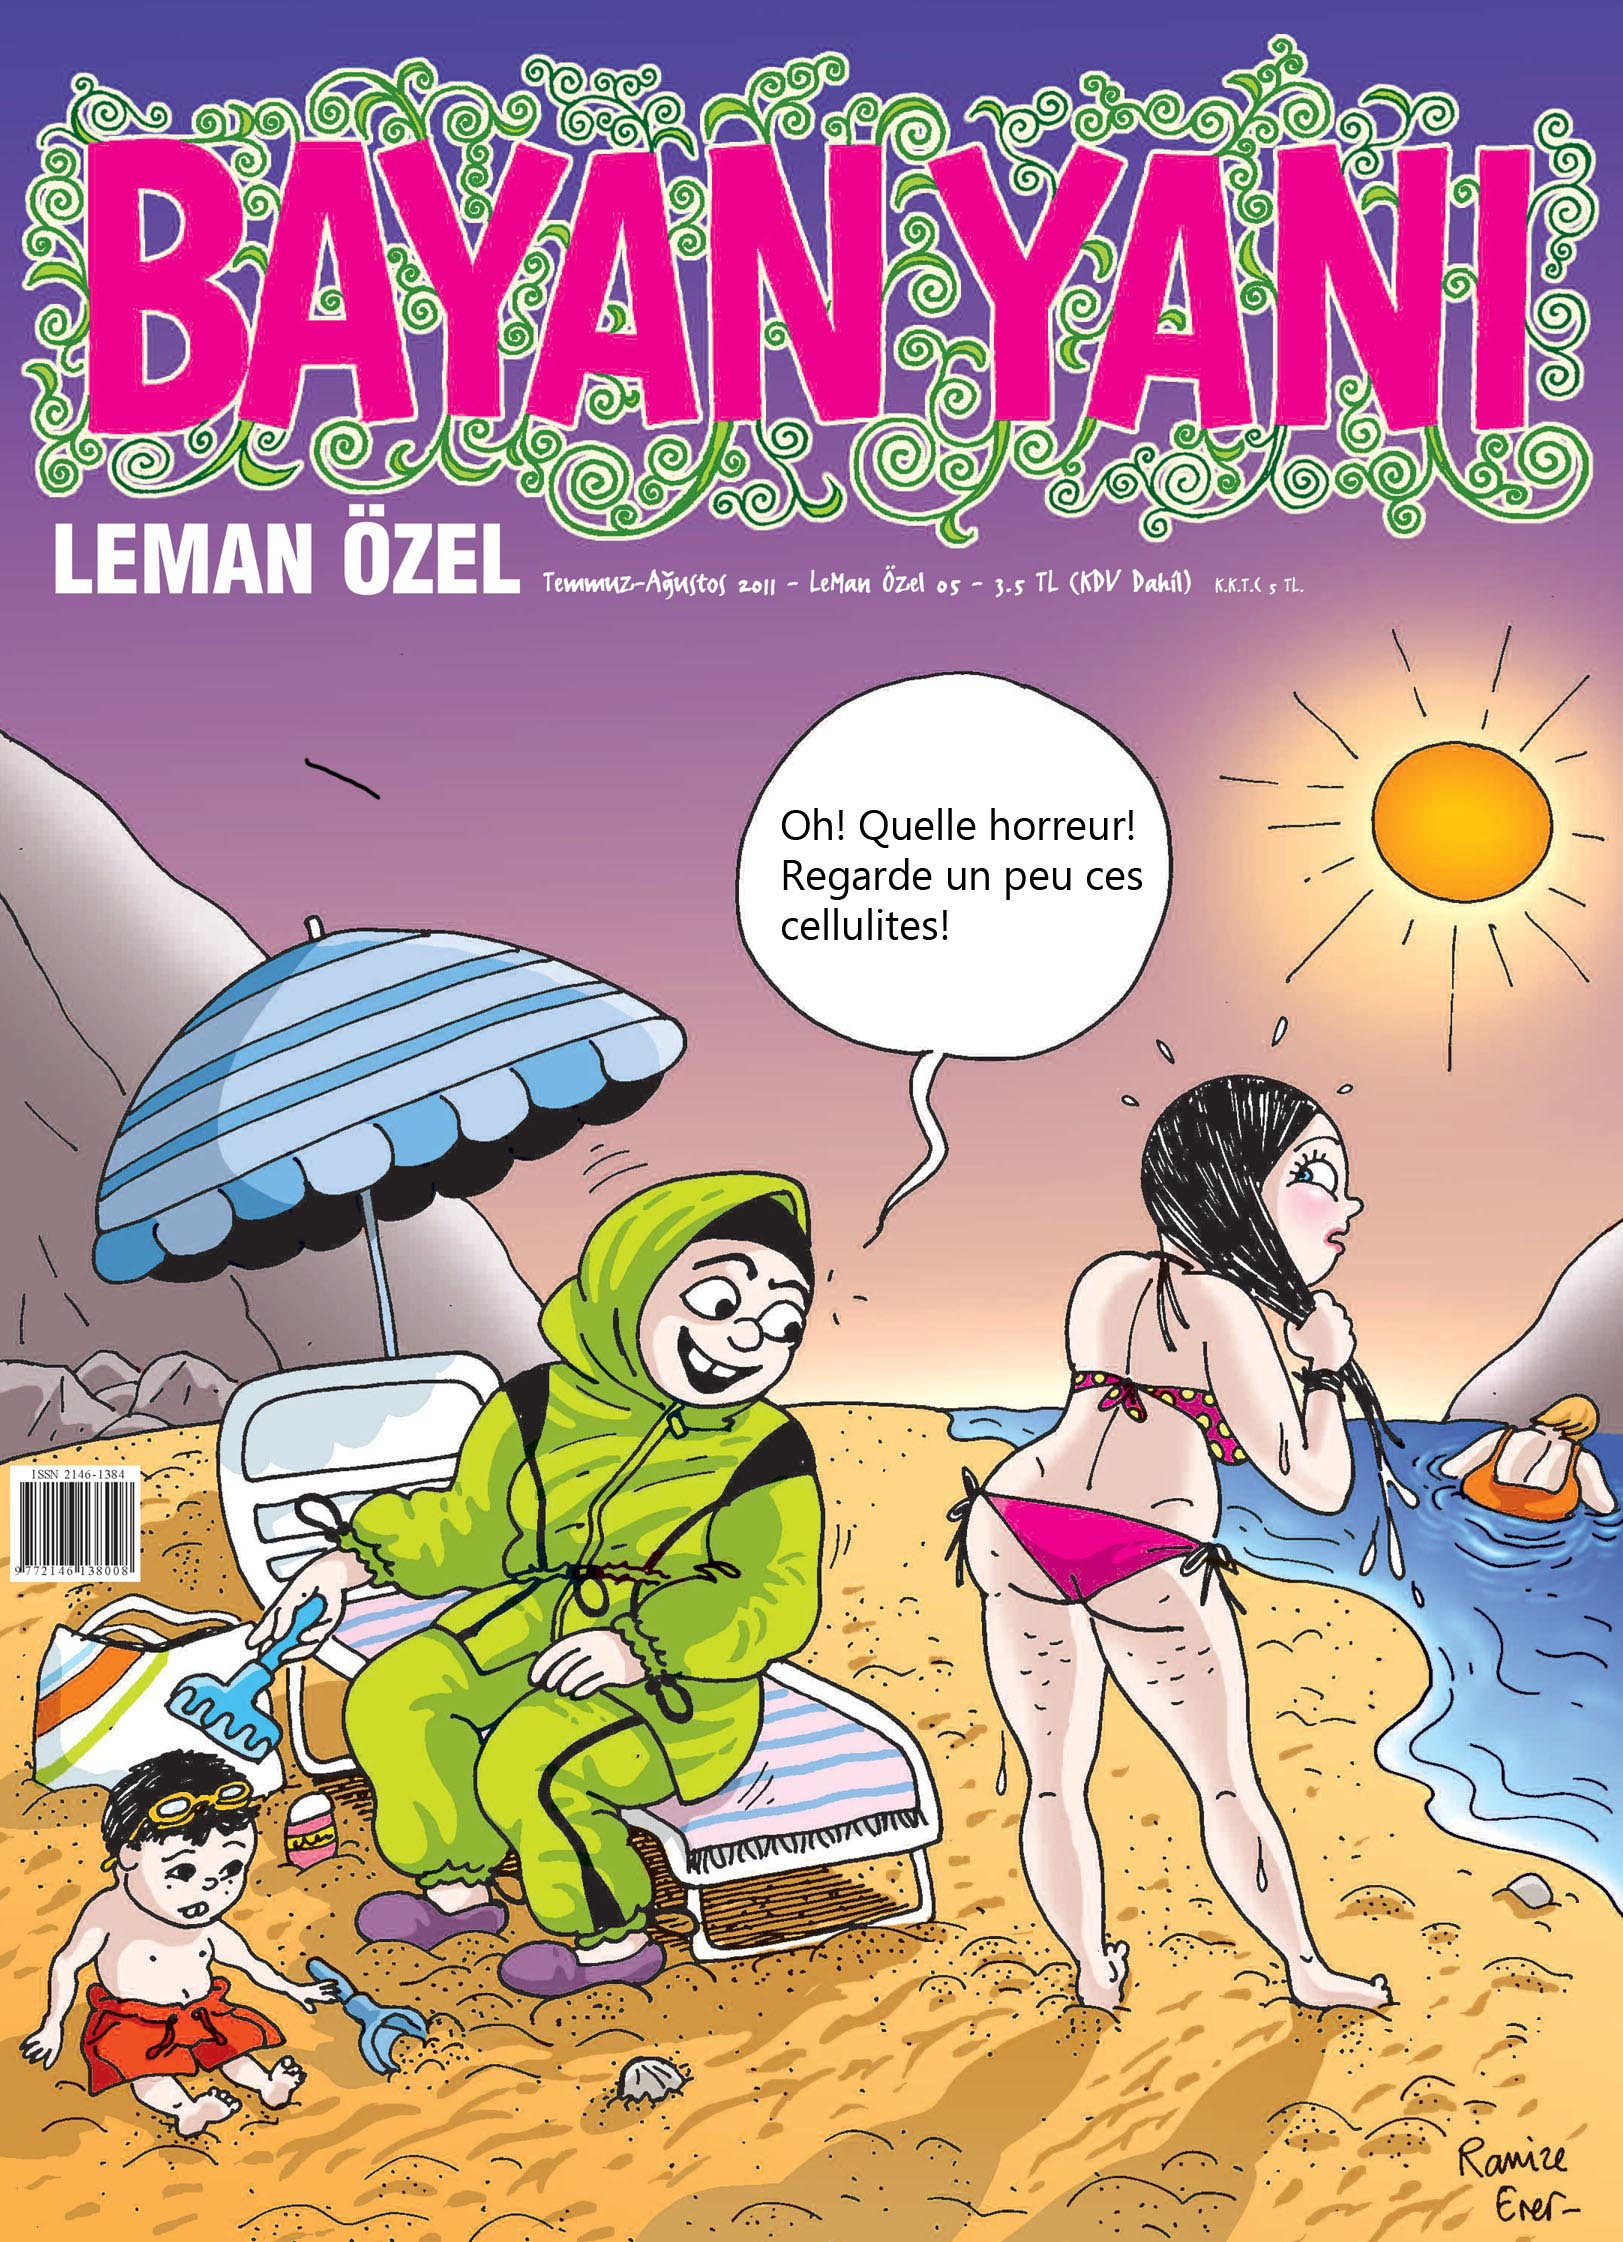 RAMIZE-ERRER-cartoonist-5